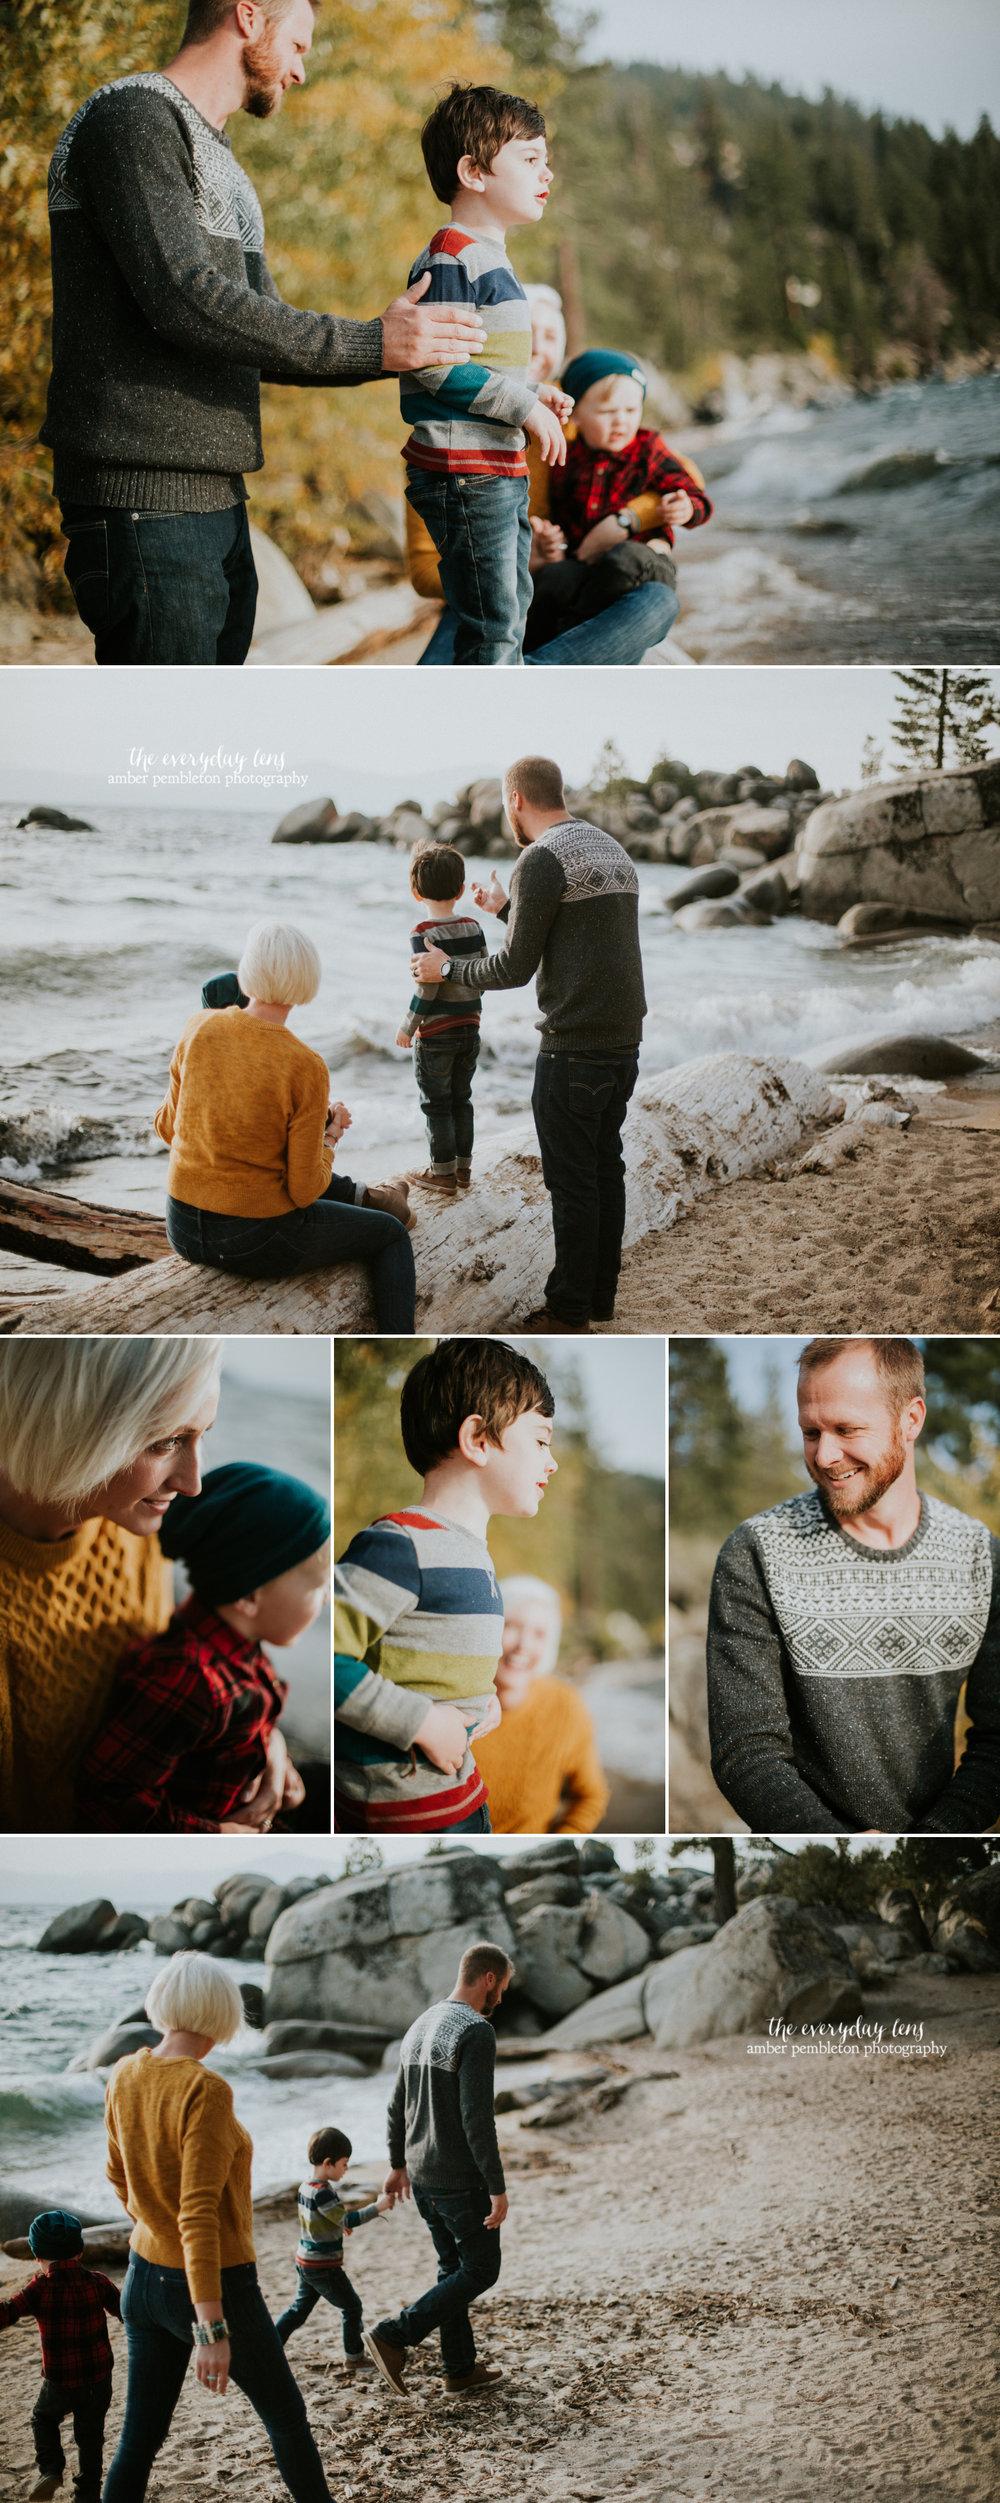 tahoe-fall-family-photo-session-chimney-beach 4.jpg